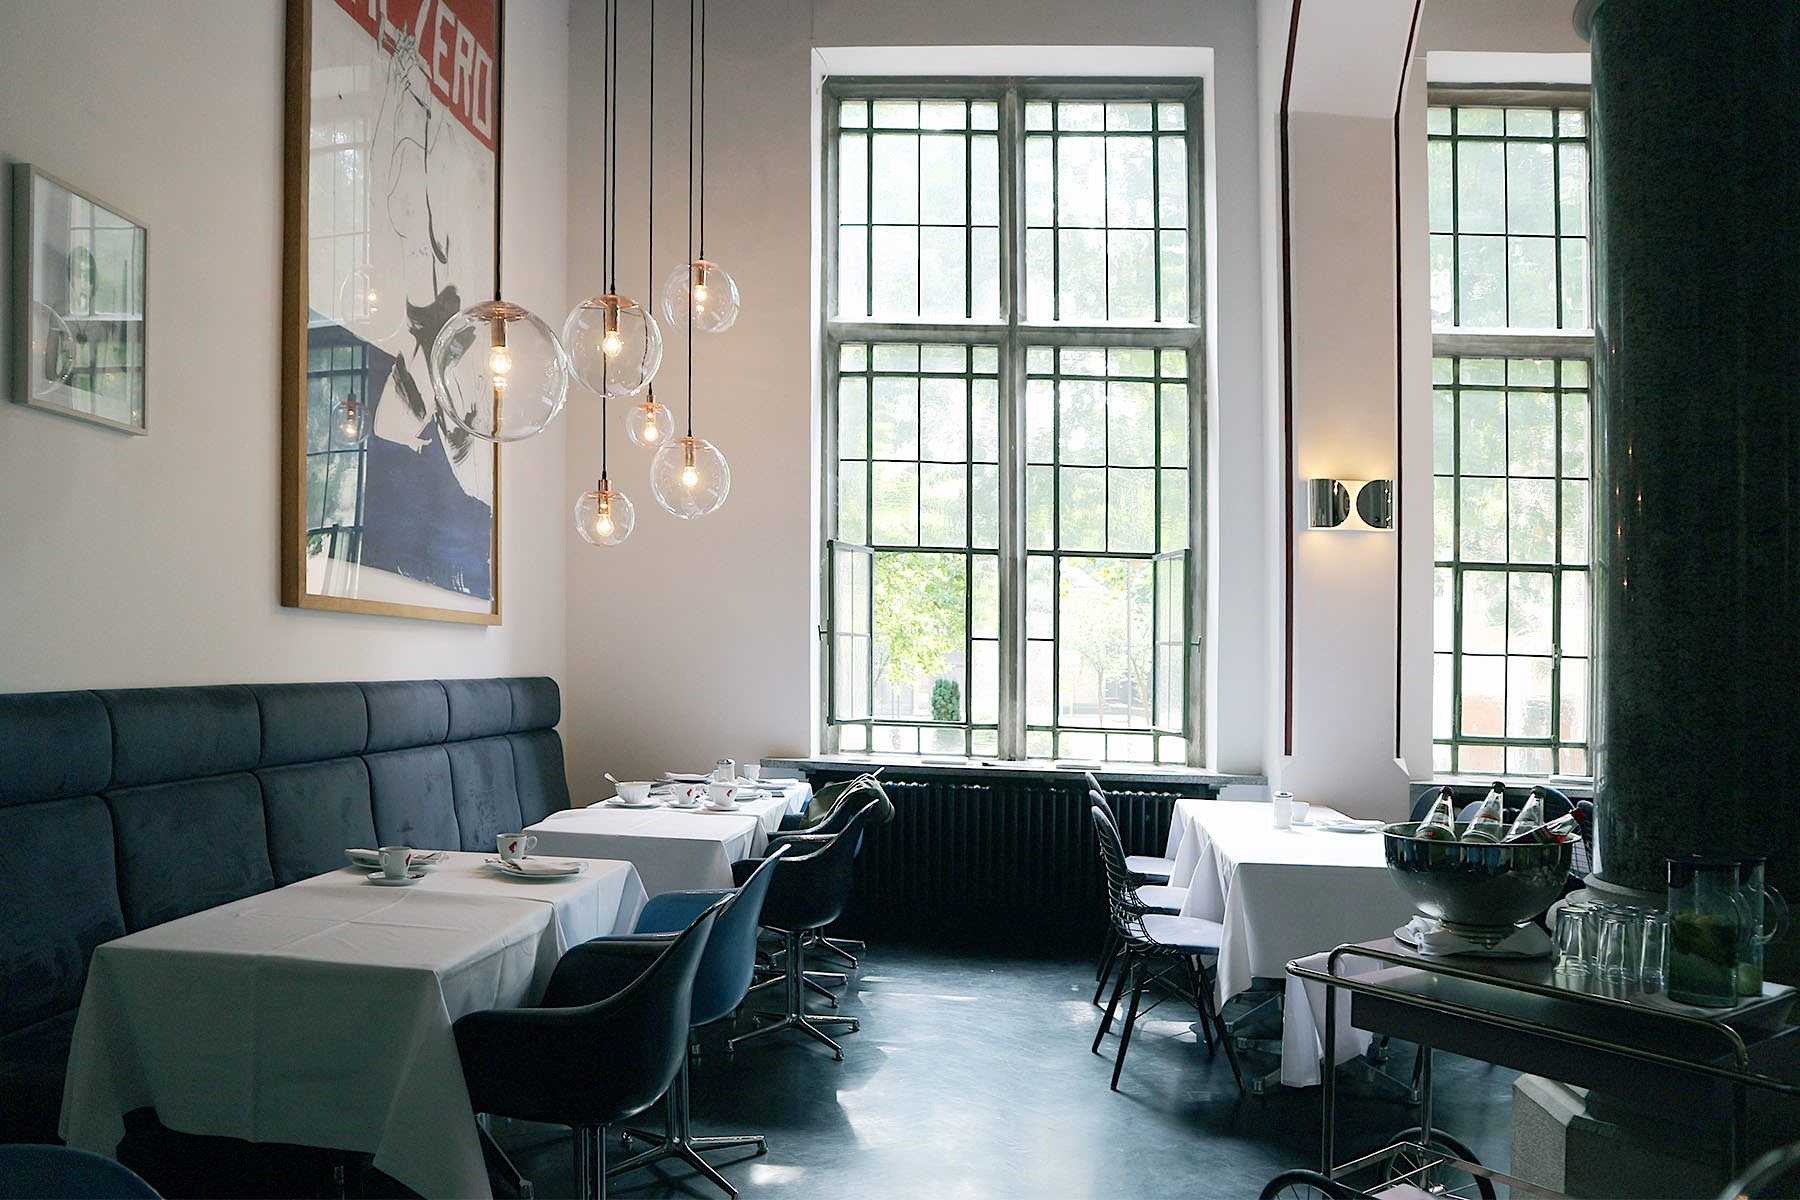 The Qvest Hotel. Lounge, Bar und Frühstückssaal